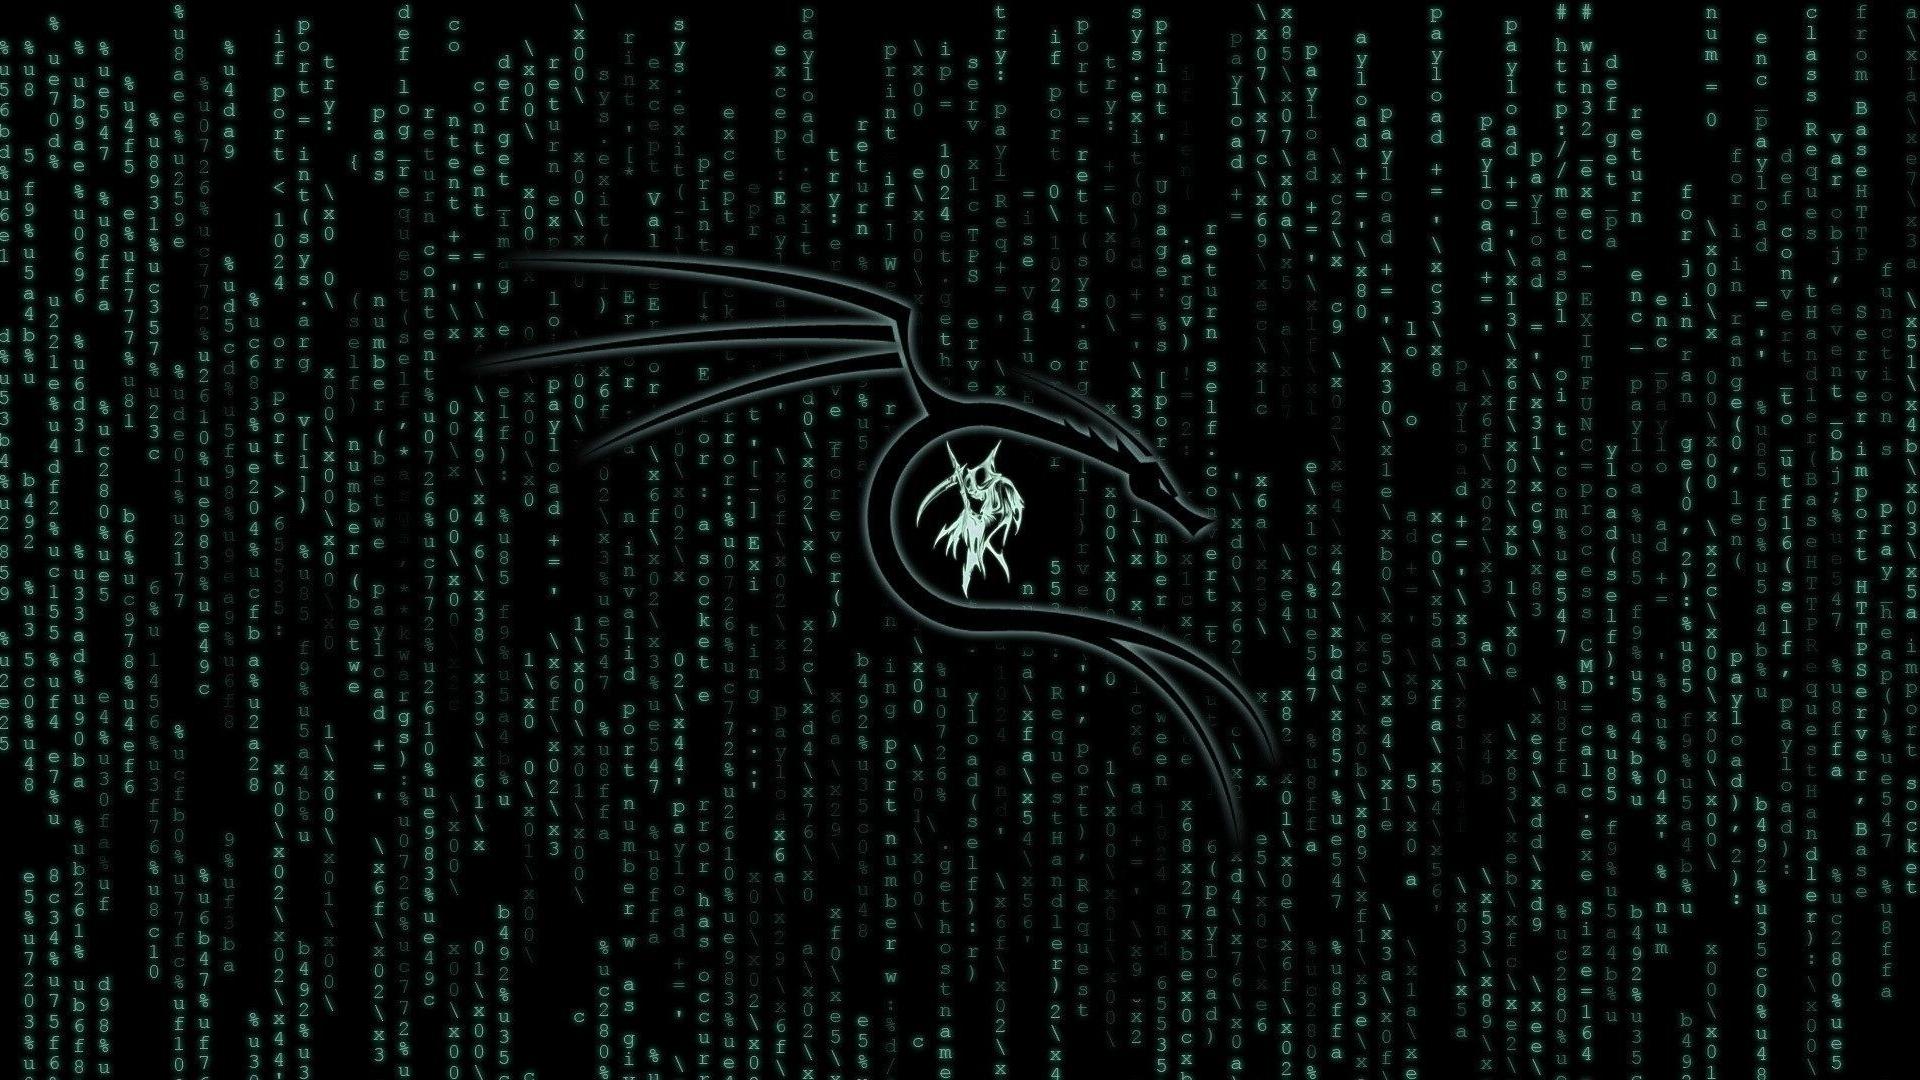 1920x1080 Kali Linux Matrix 1080p Laptop Full Hd Wallpaper Hd Hi Tech 4k Wallpapers Images Photos And Background